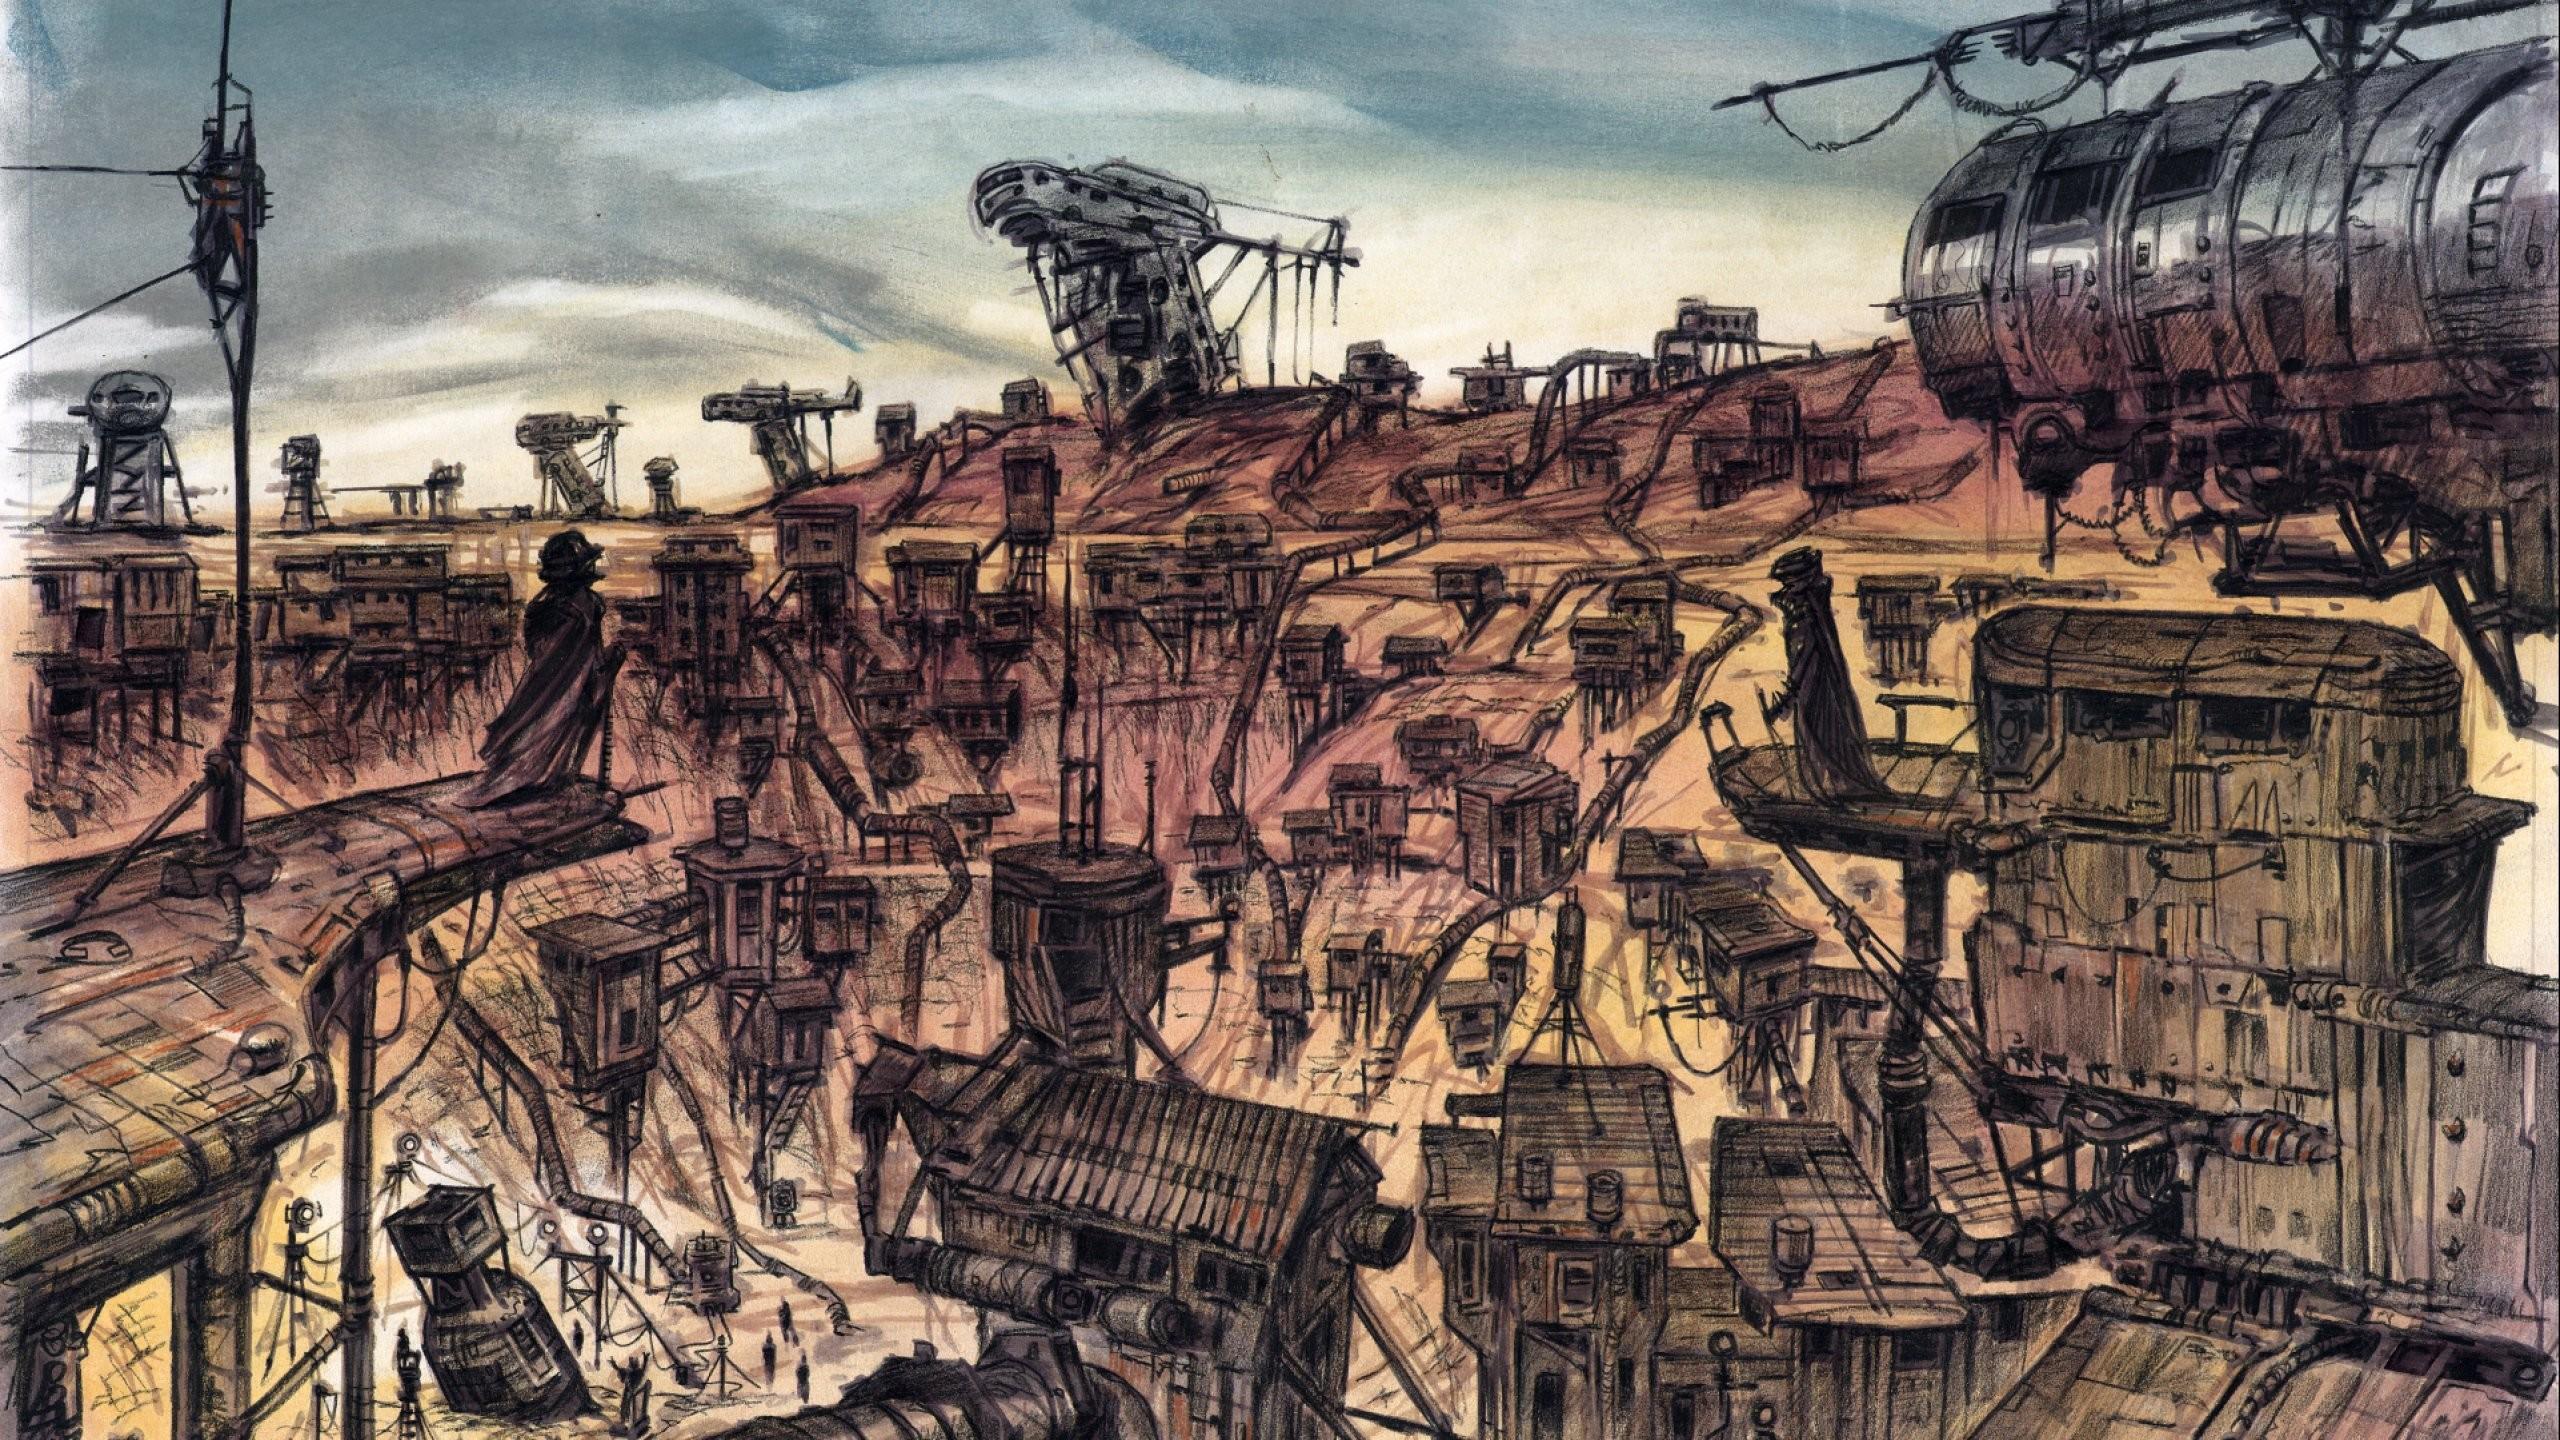 Sci-fi fantasy art artwork science fiction futuristic original adventure  fantasy wallpaper     698408   WallpaperUP